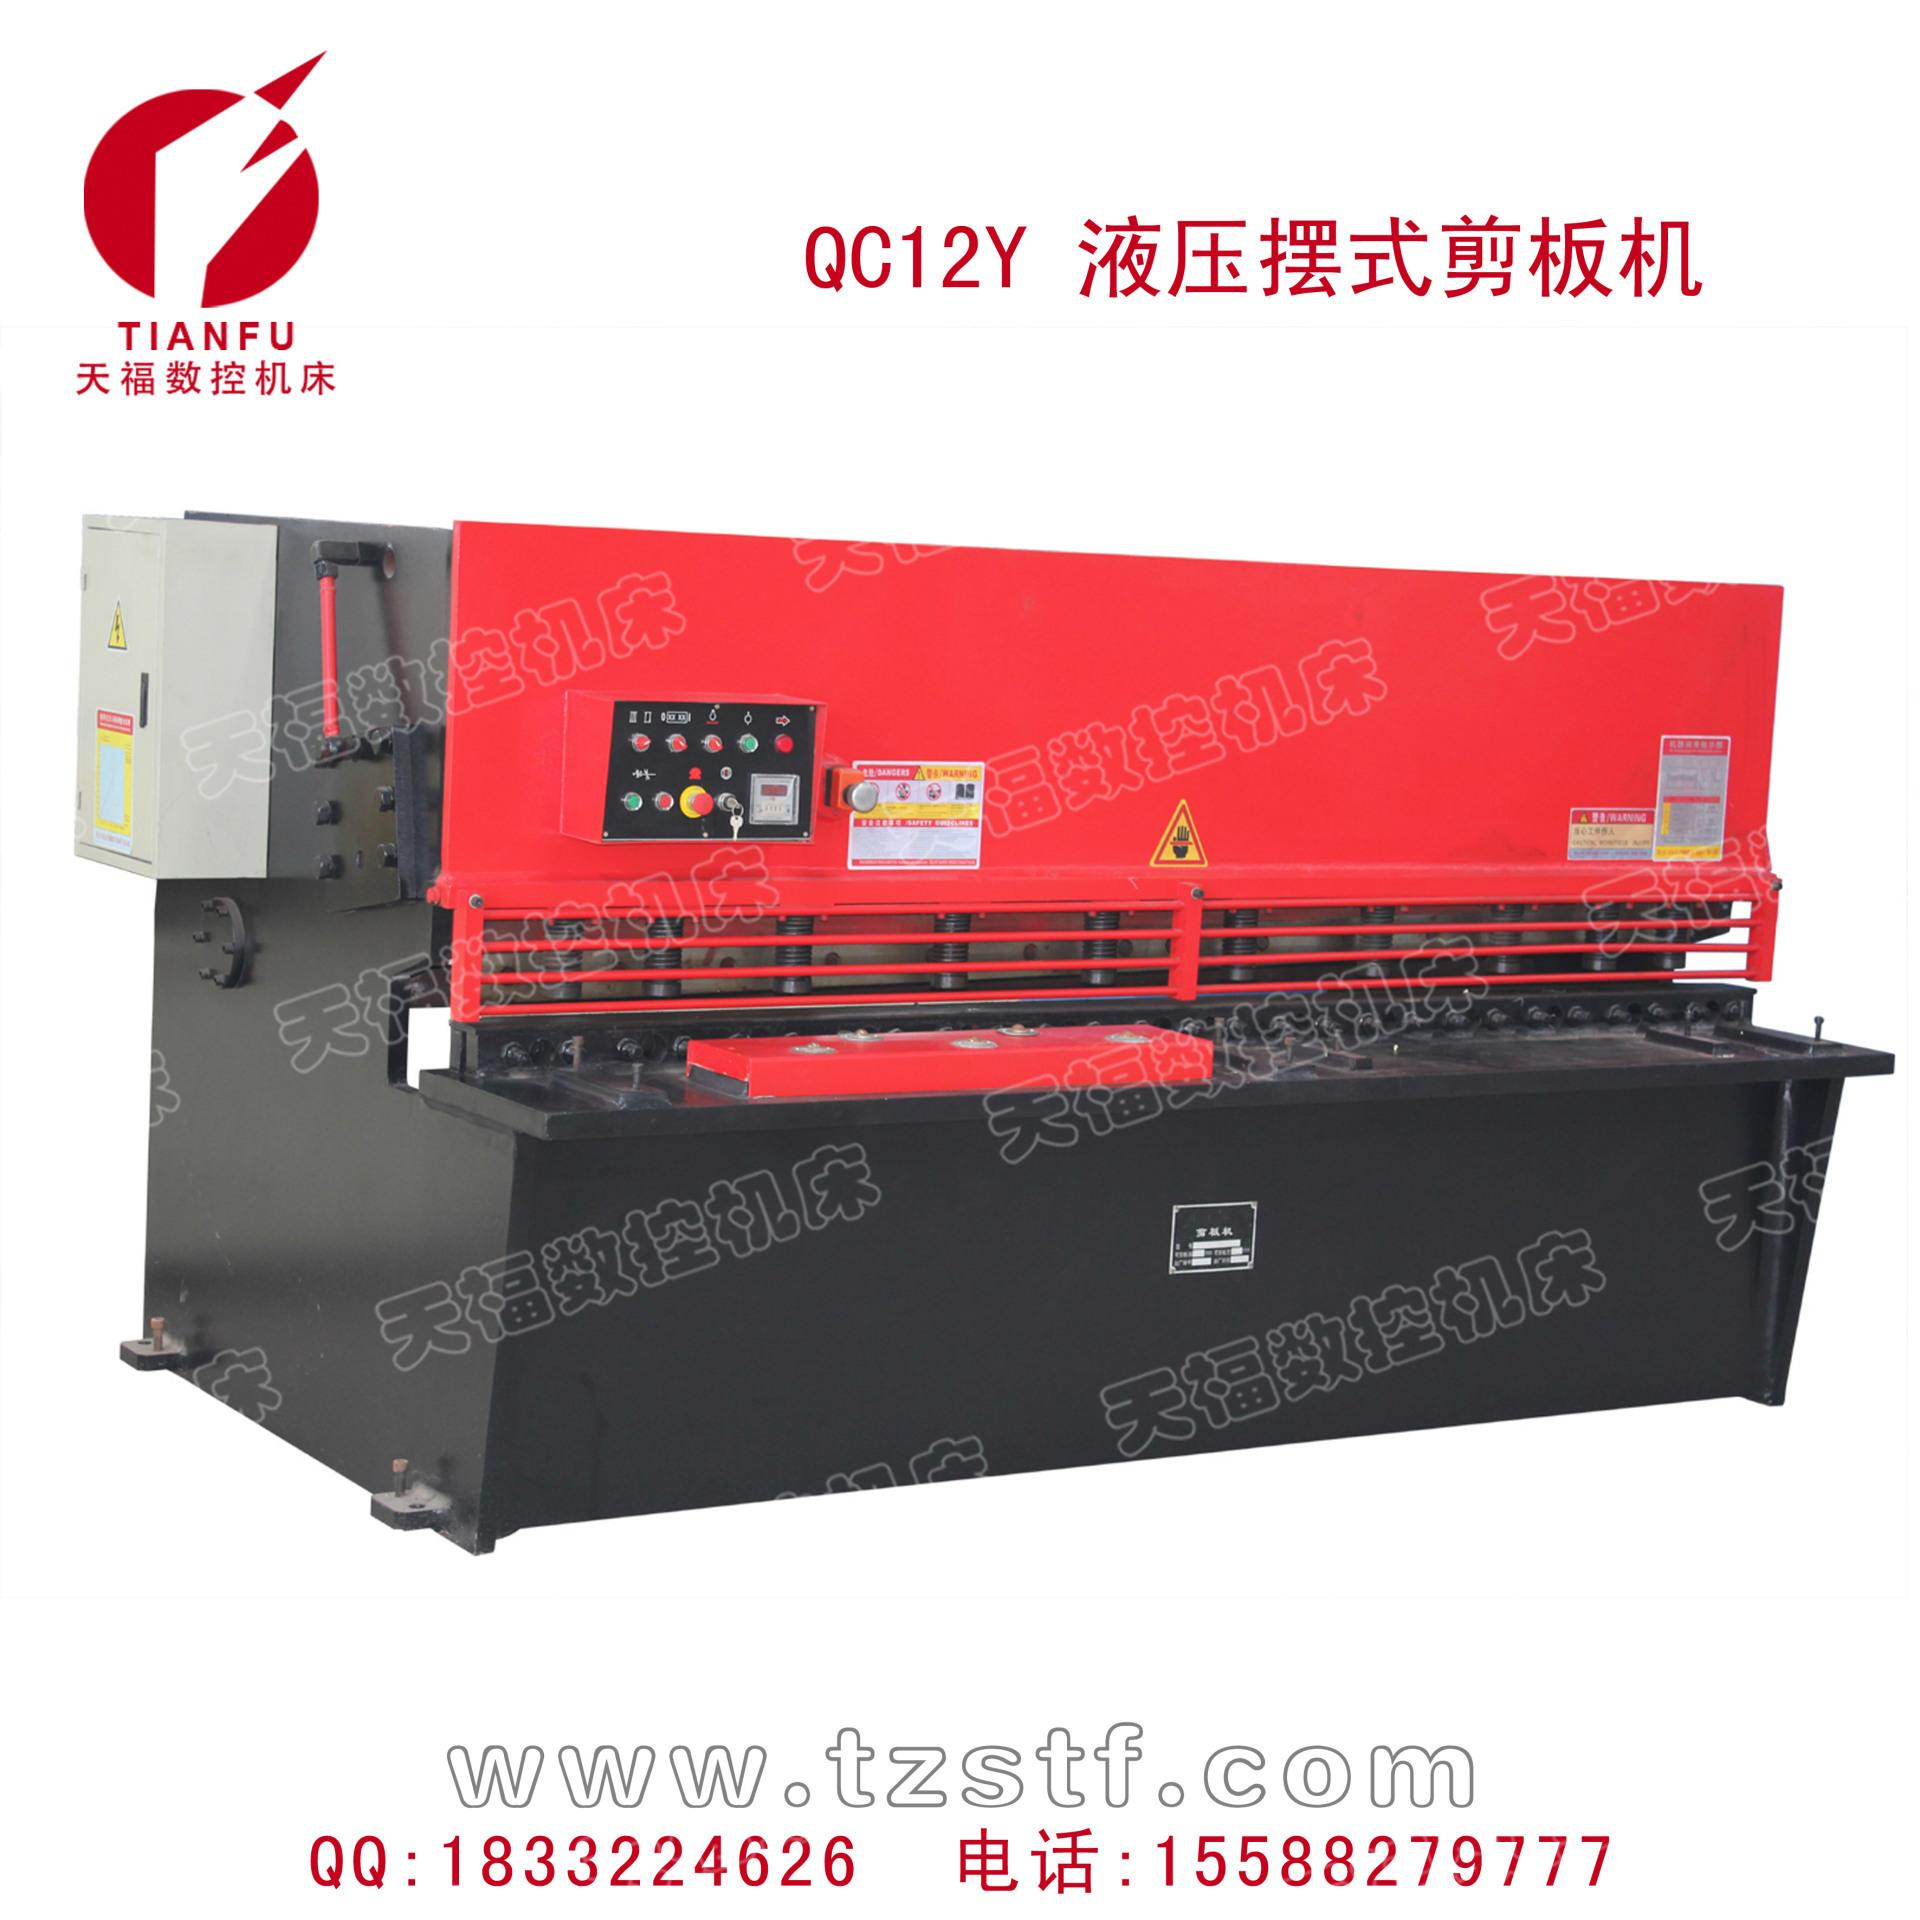 QC12Y 液压摆式剪板机